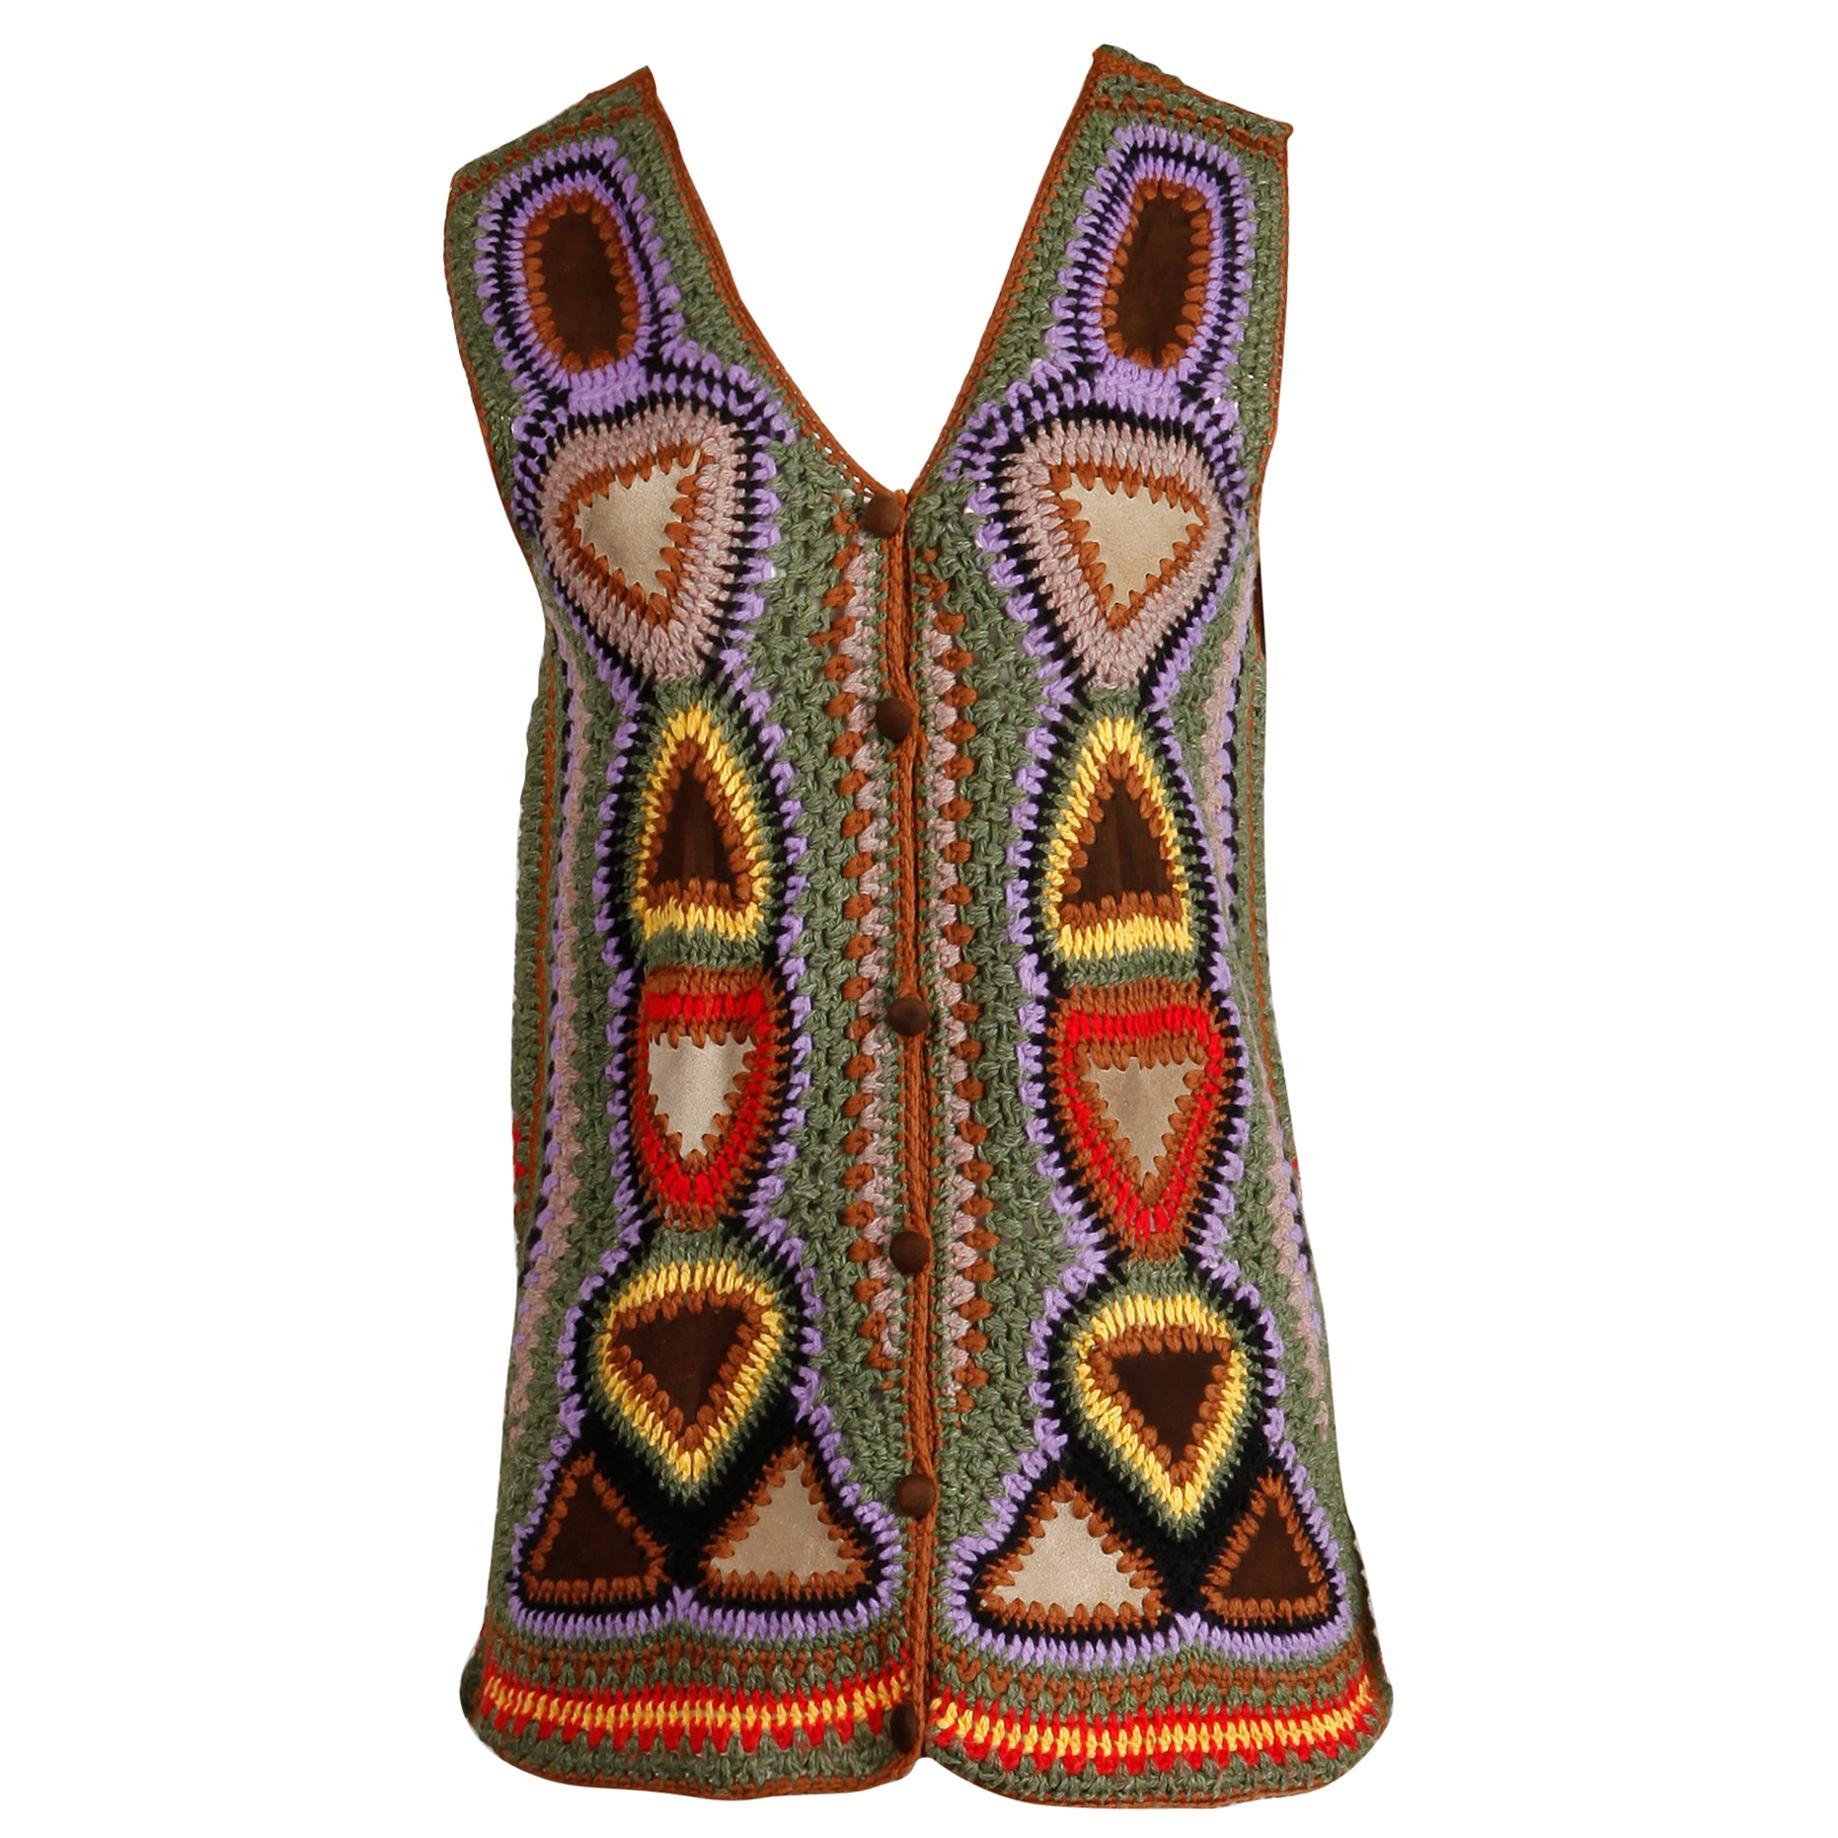 Incredible 1970s Vintage Hippie Boho Crochet Wool + Suede Leather Vest Jacket